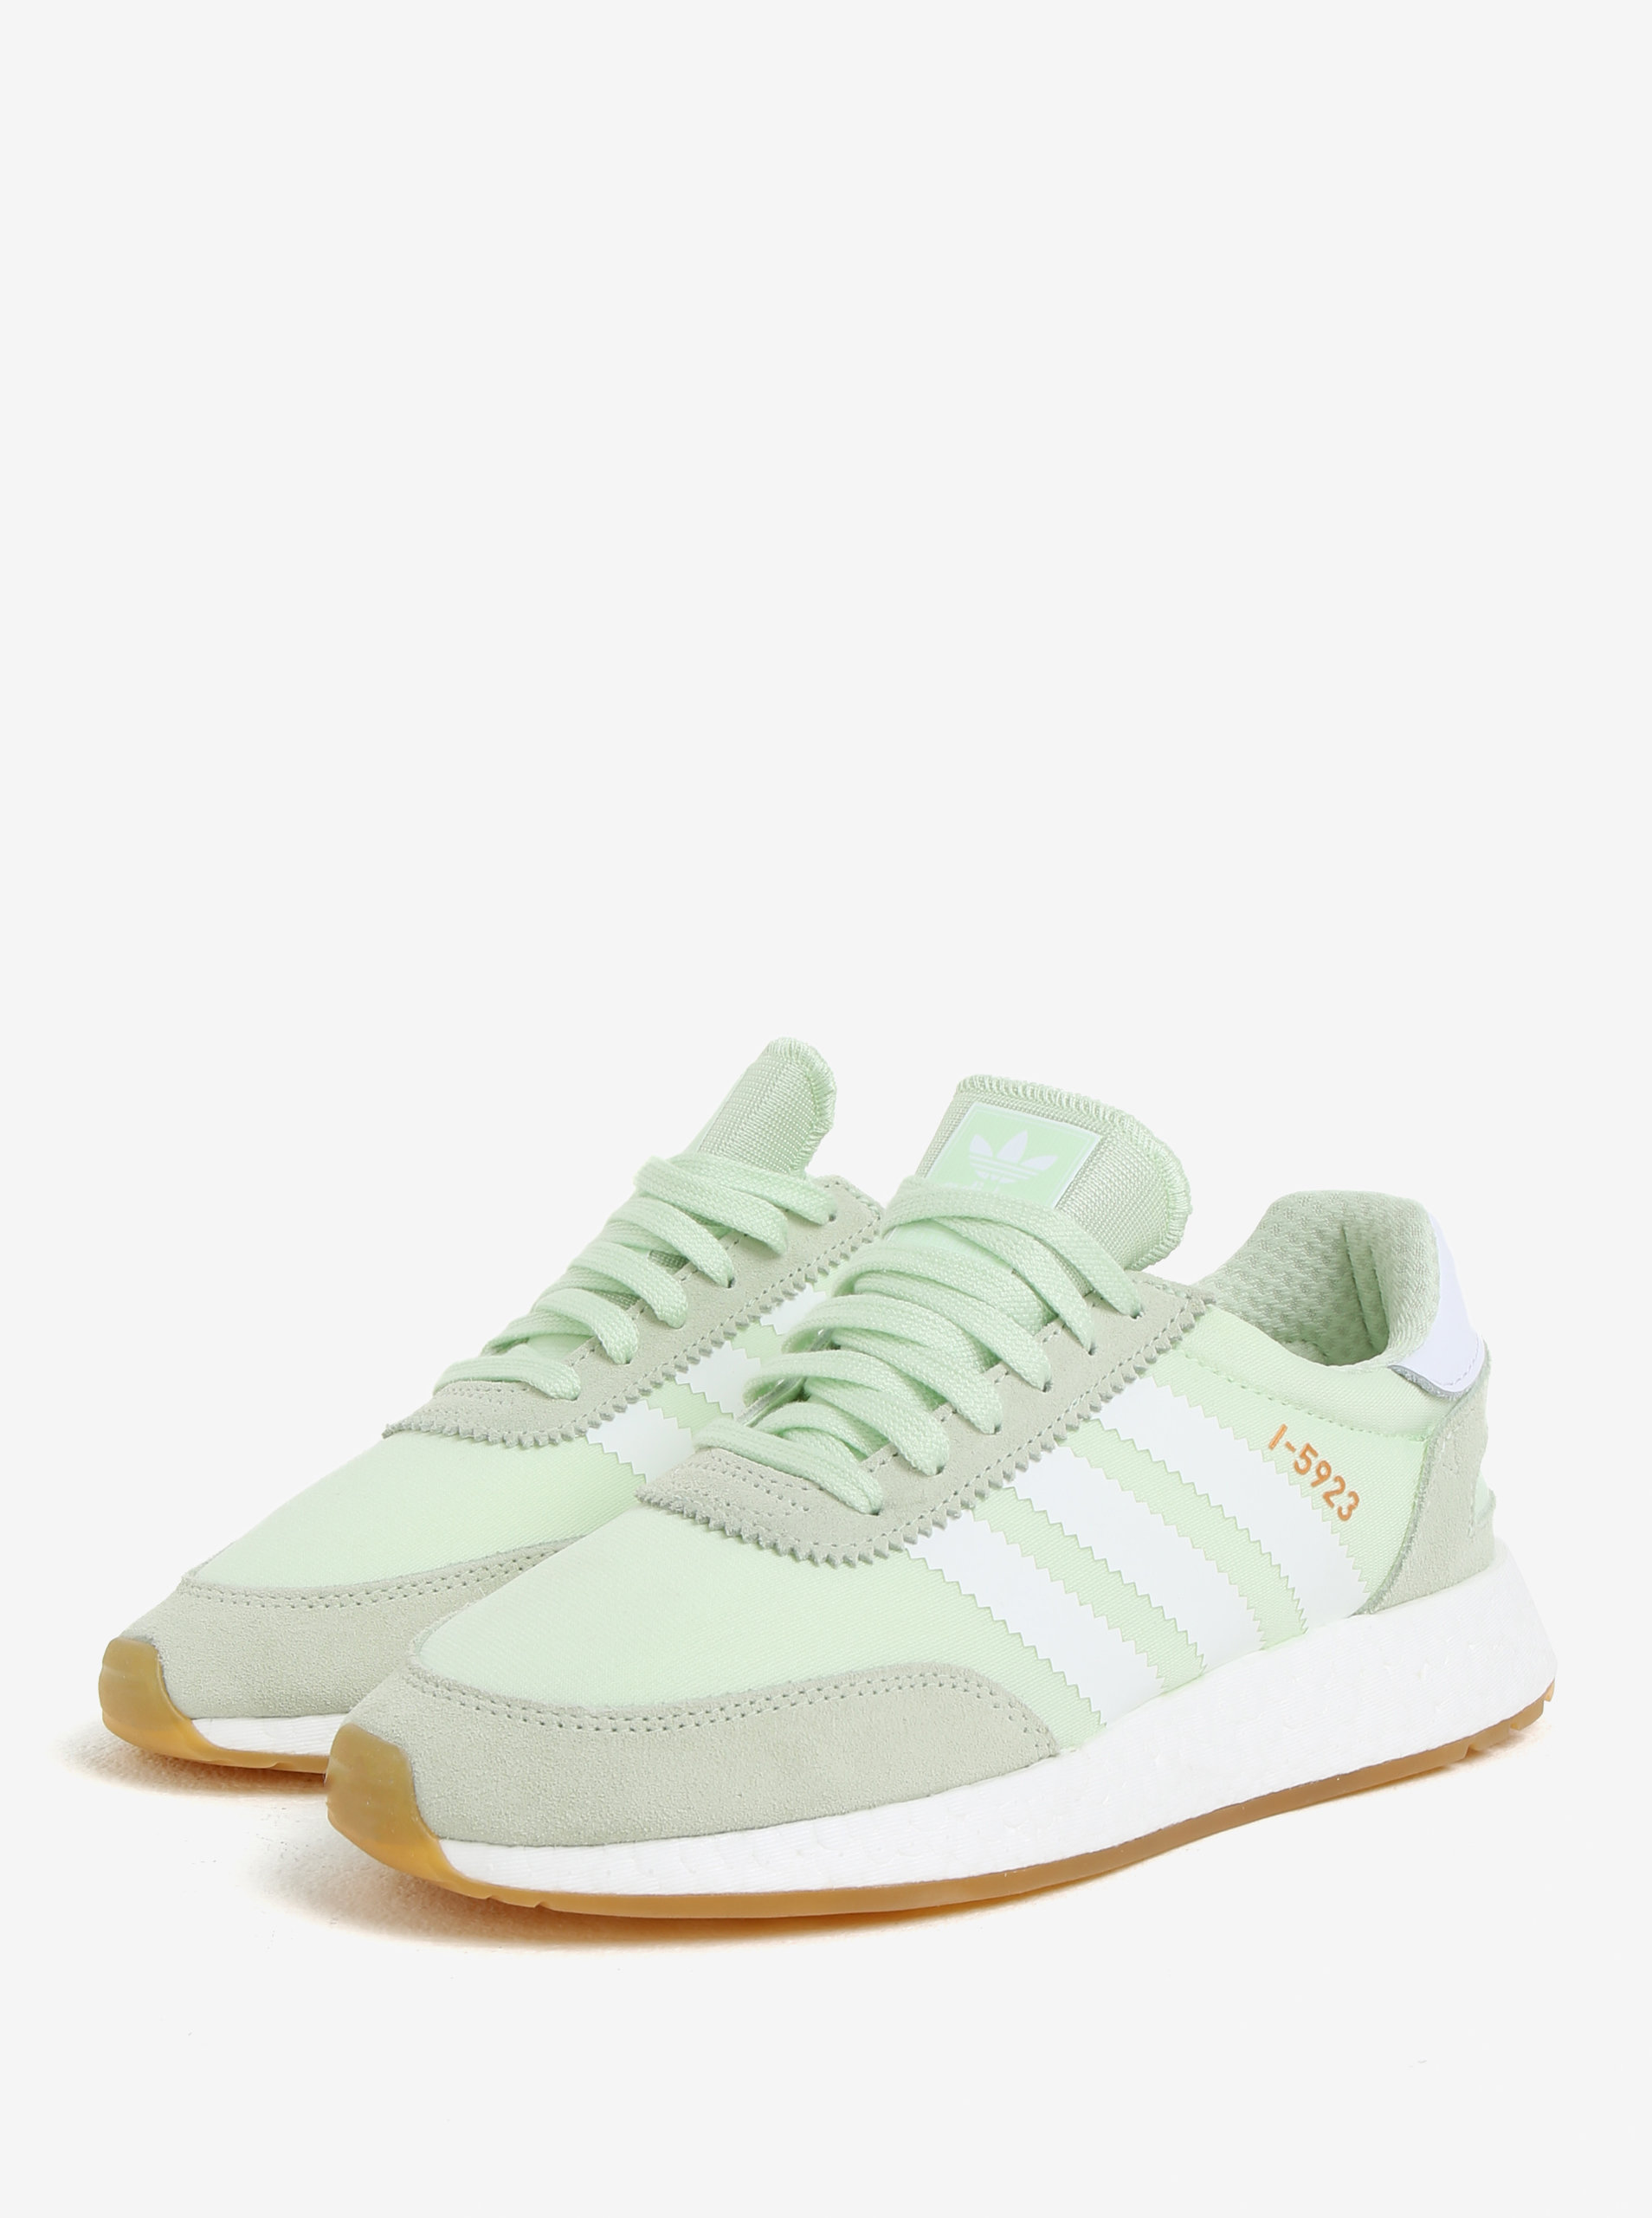 Zelené dámské tenisky adidas Originals Iniki Runner ... 35bbe83eb6